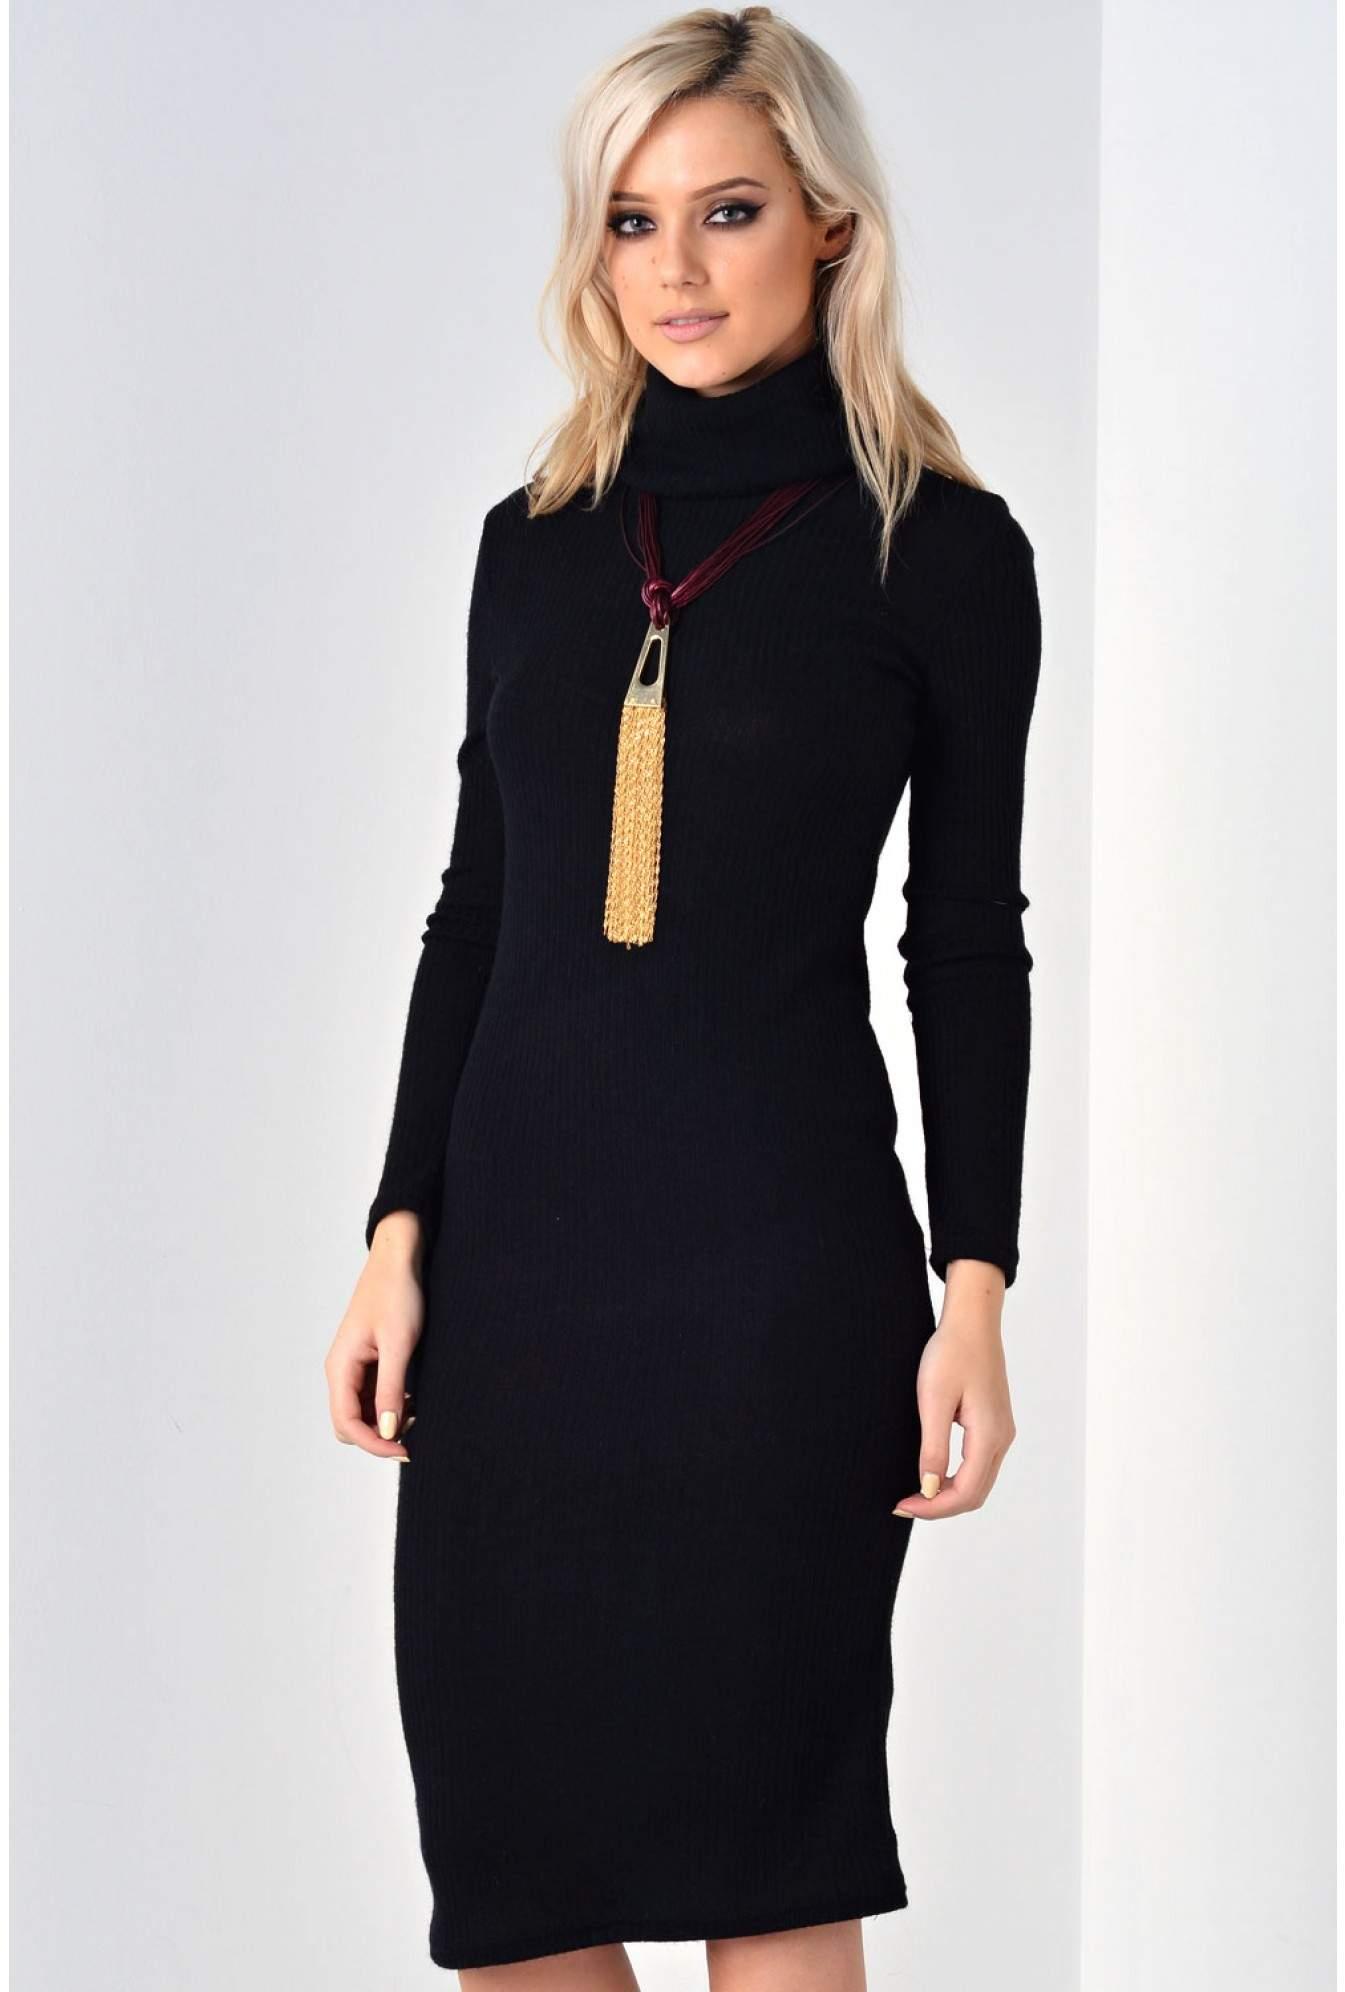 d227e7572f15 Glamorous Aspen Polo Neck Knit Dress in Black   iCLOTHING